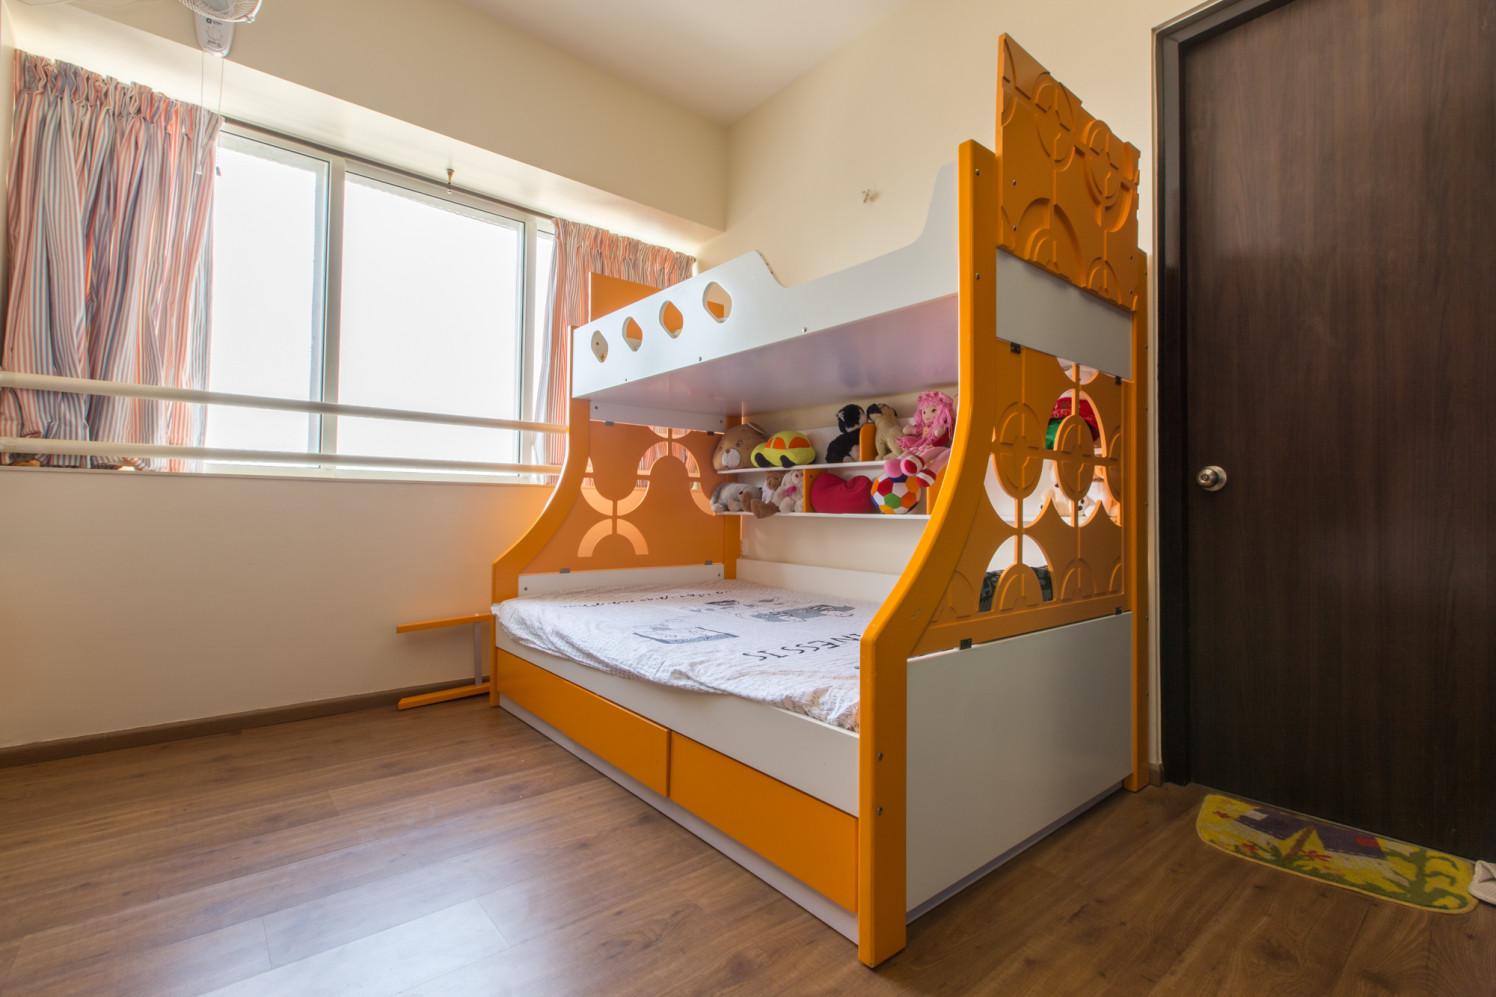 Wooden floor Kids Bedroom with window by MakeMyCasa Bedroom Modern | Interior Design Photos & Ideas